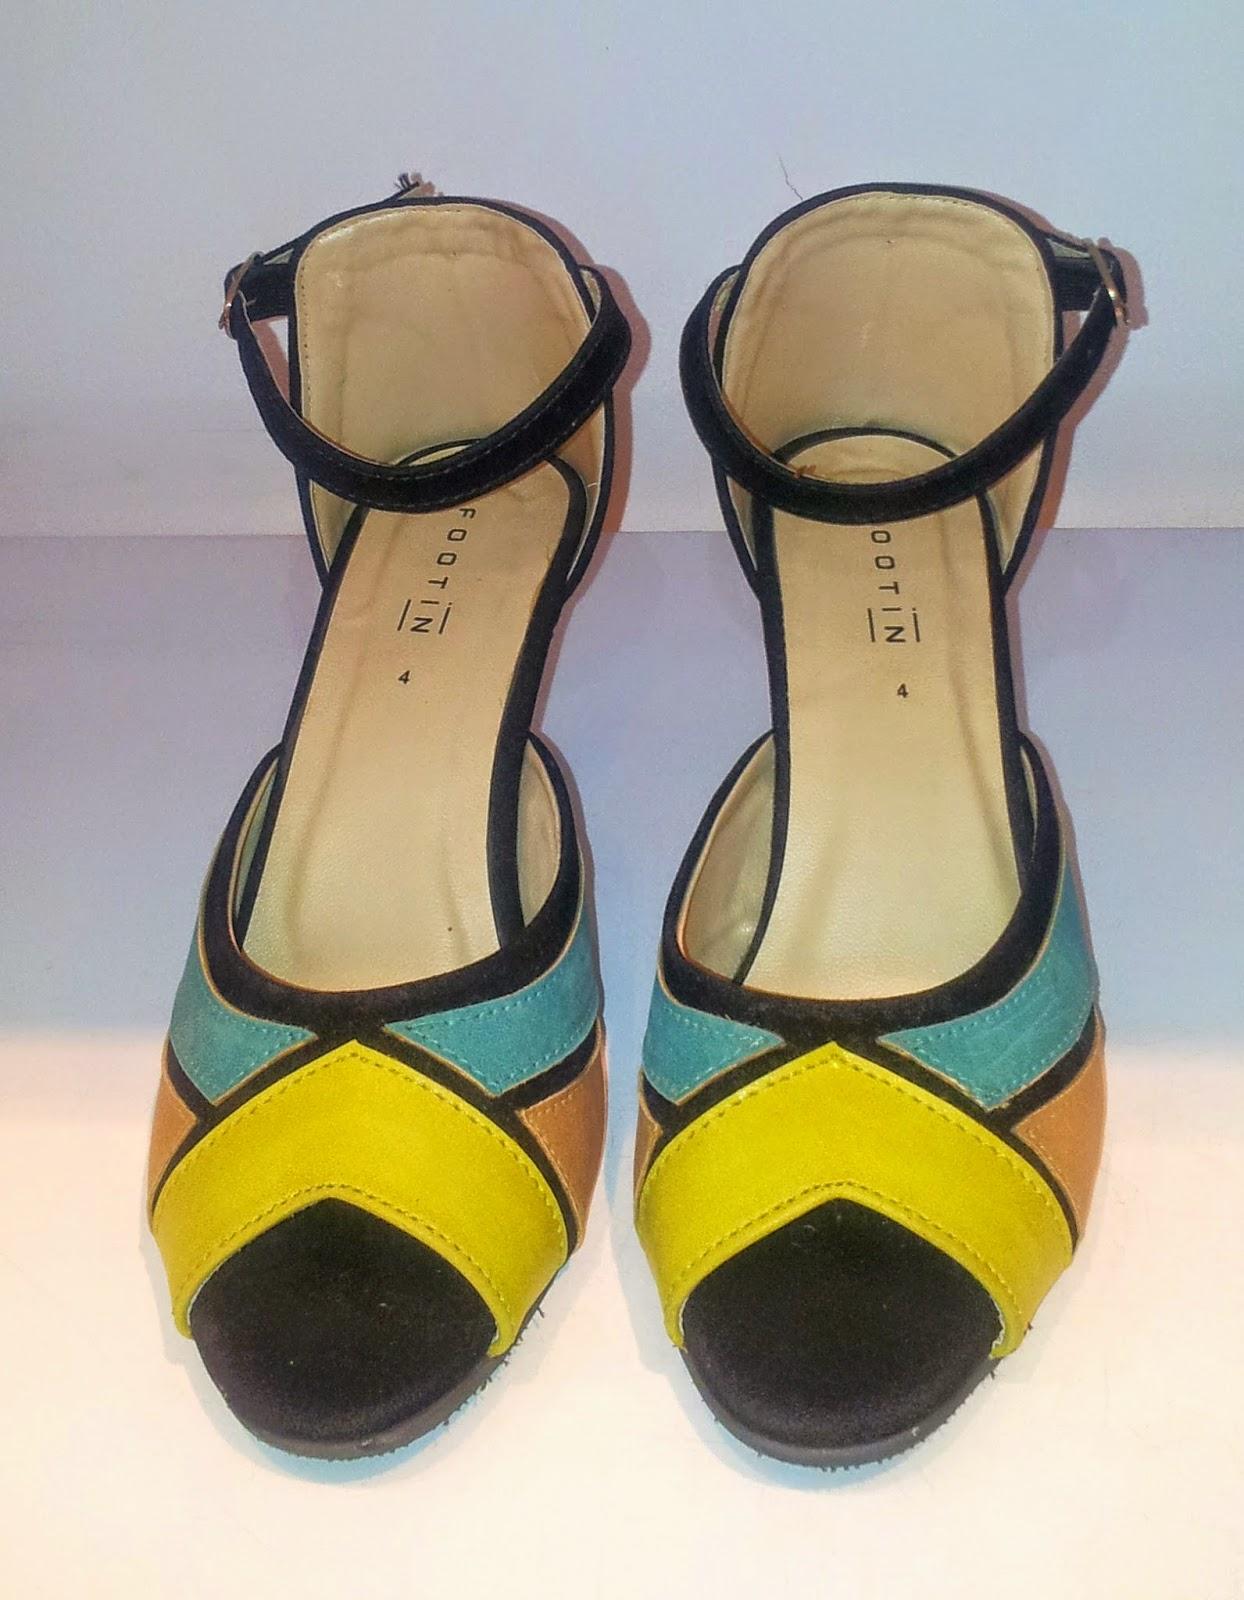 Stylish Colour-Block Peep-Toe Ankle Strap Sandals in Teal e12a71de19762